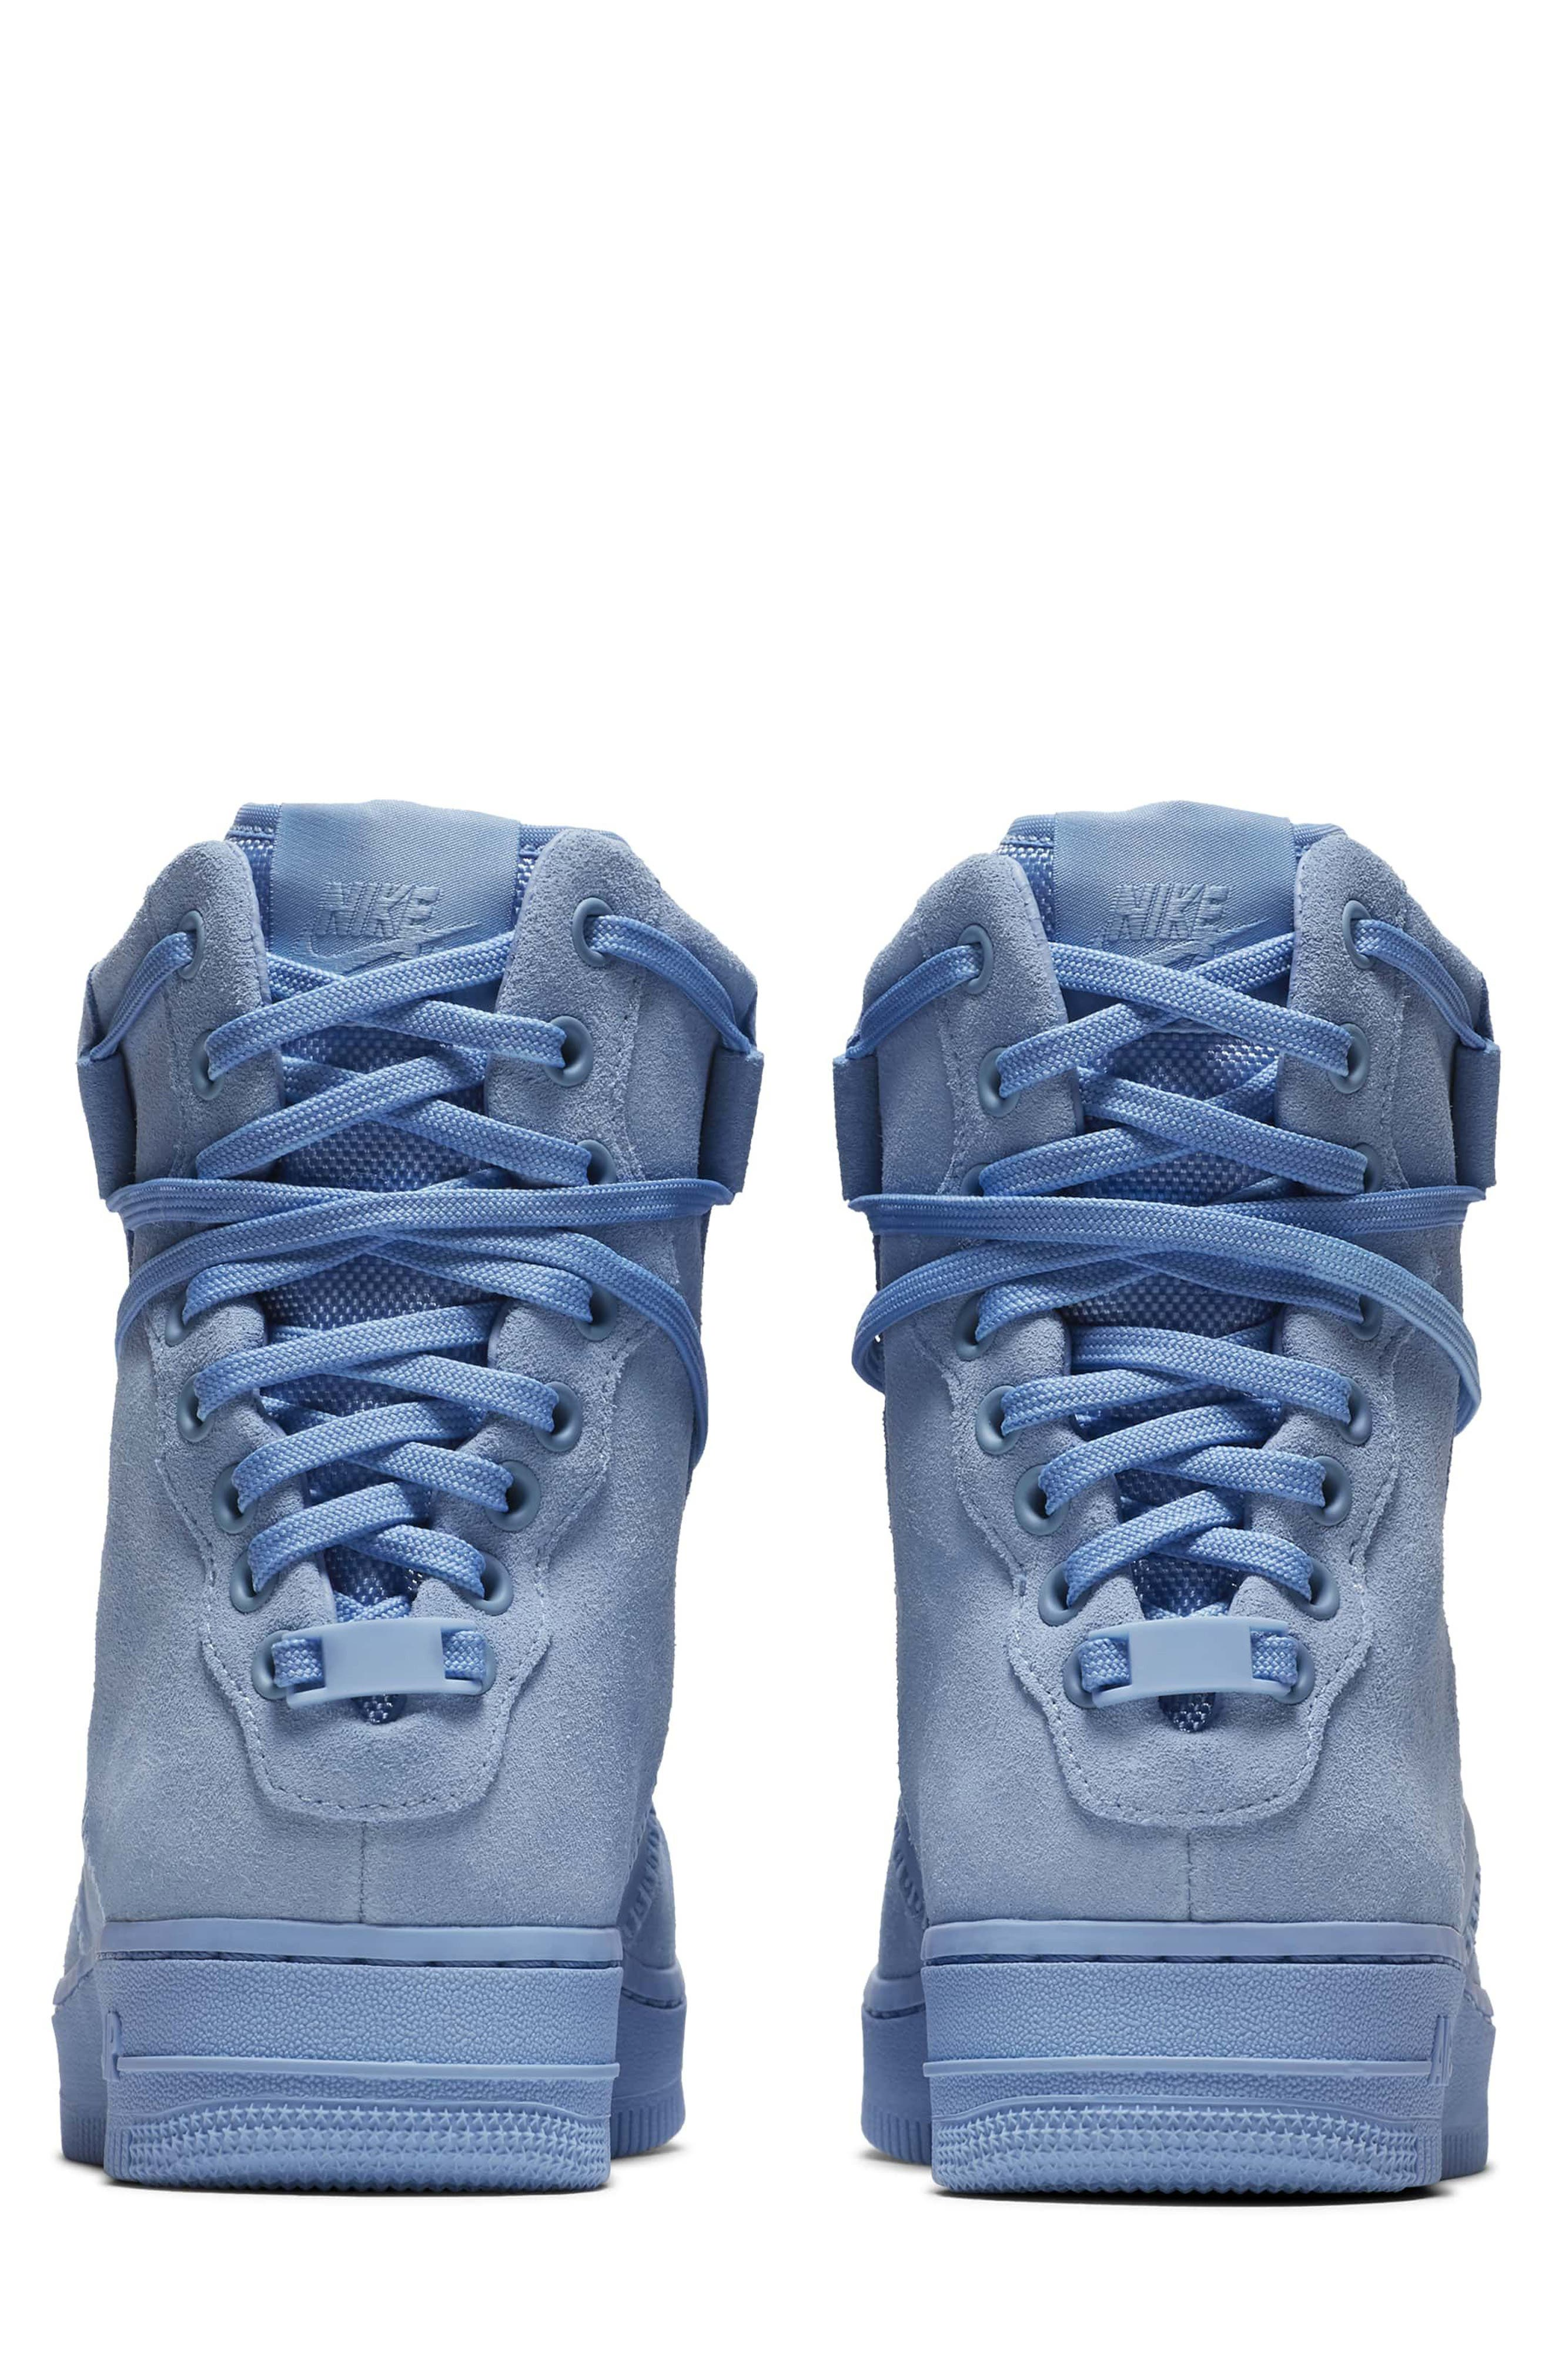 Air Force 1 Rebel XX High Top Sneaker,                             Alternate thumbnail 2, color,                             Light Blue